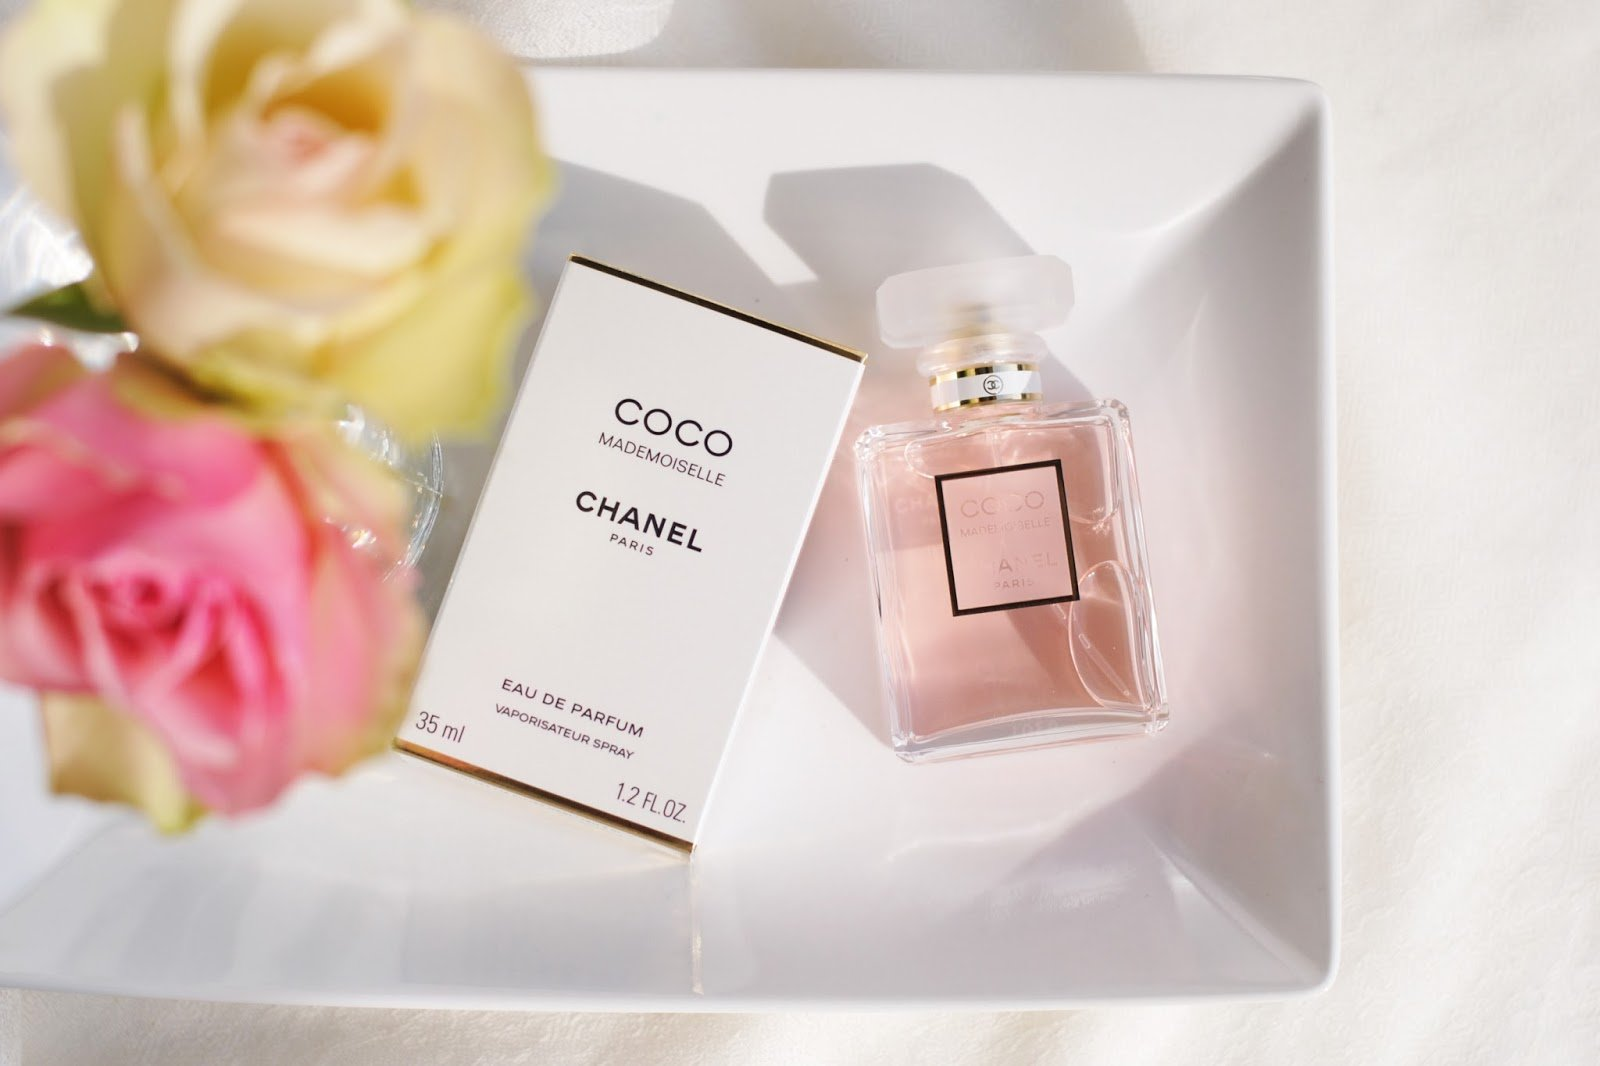 https://www.tonamodaimports.com.br/chanel-coco-mademoiselle-eau-de-parfum